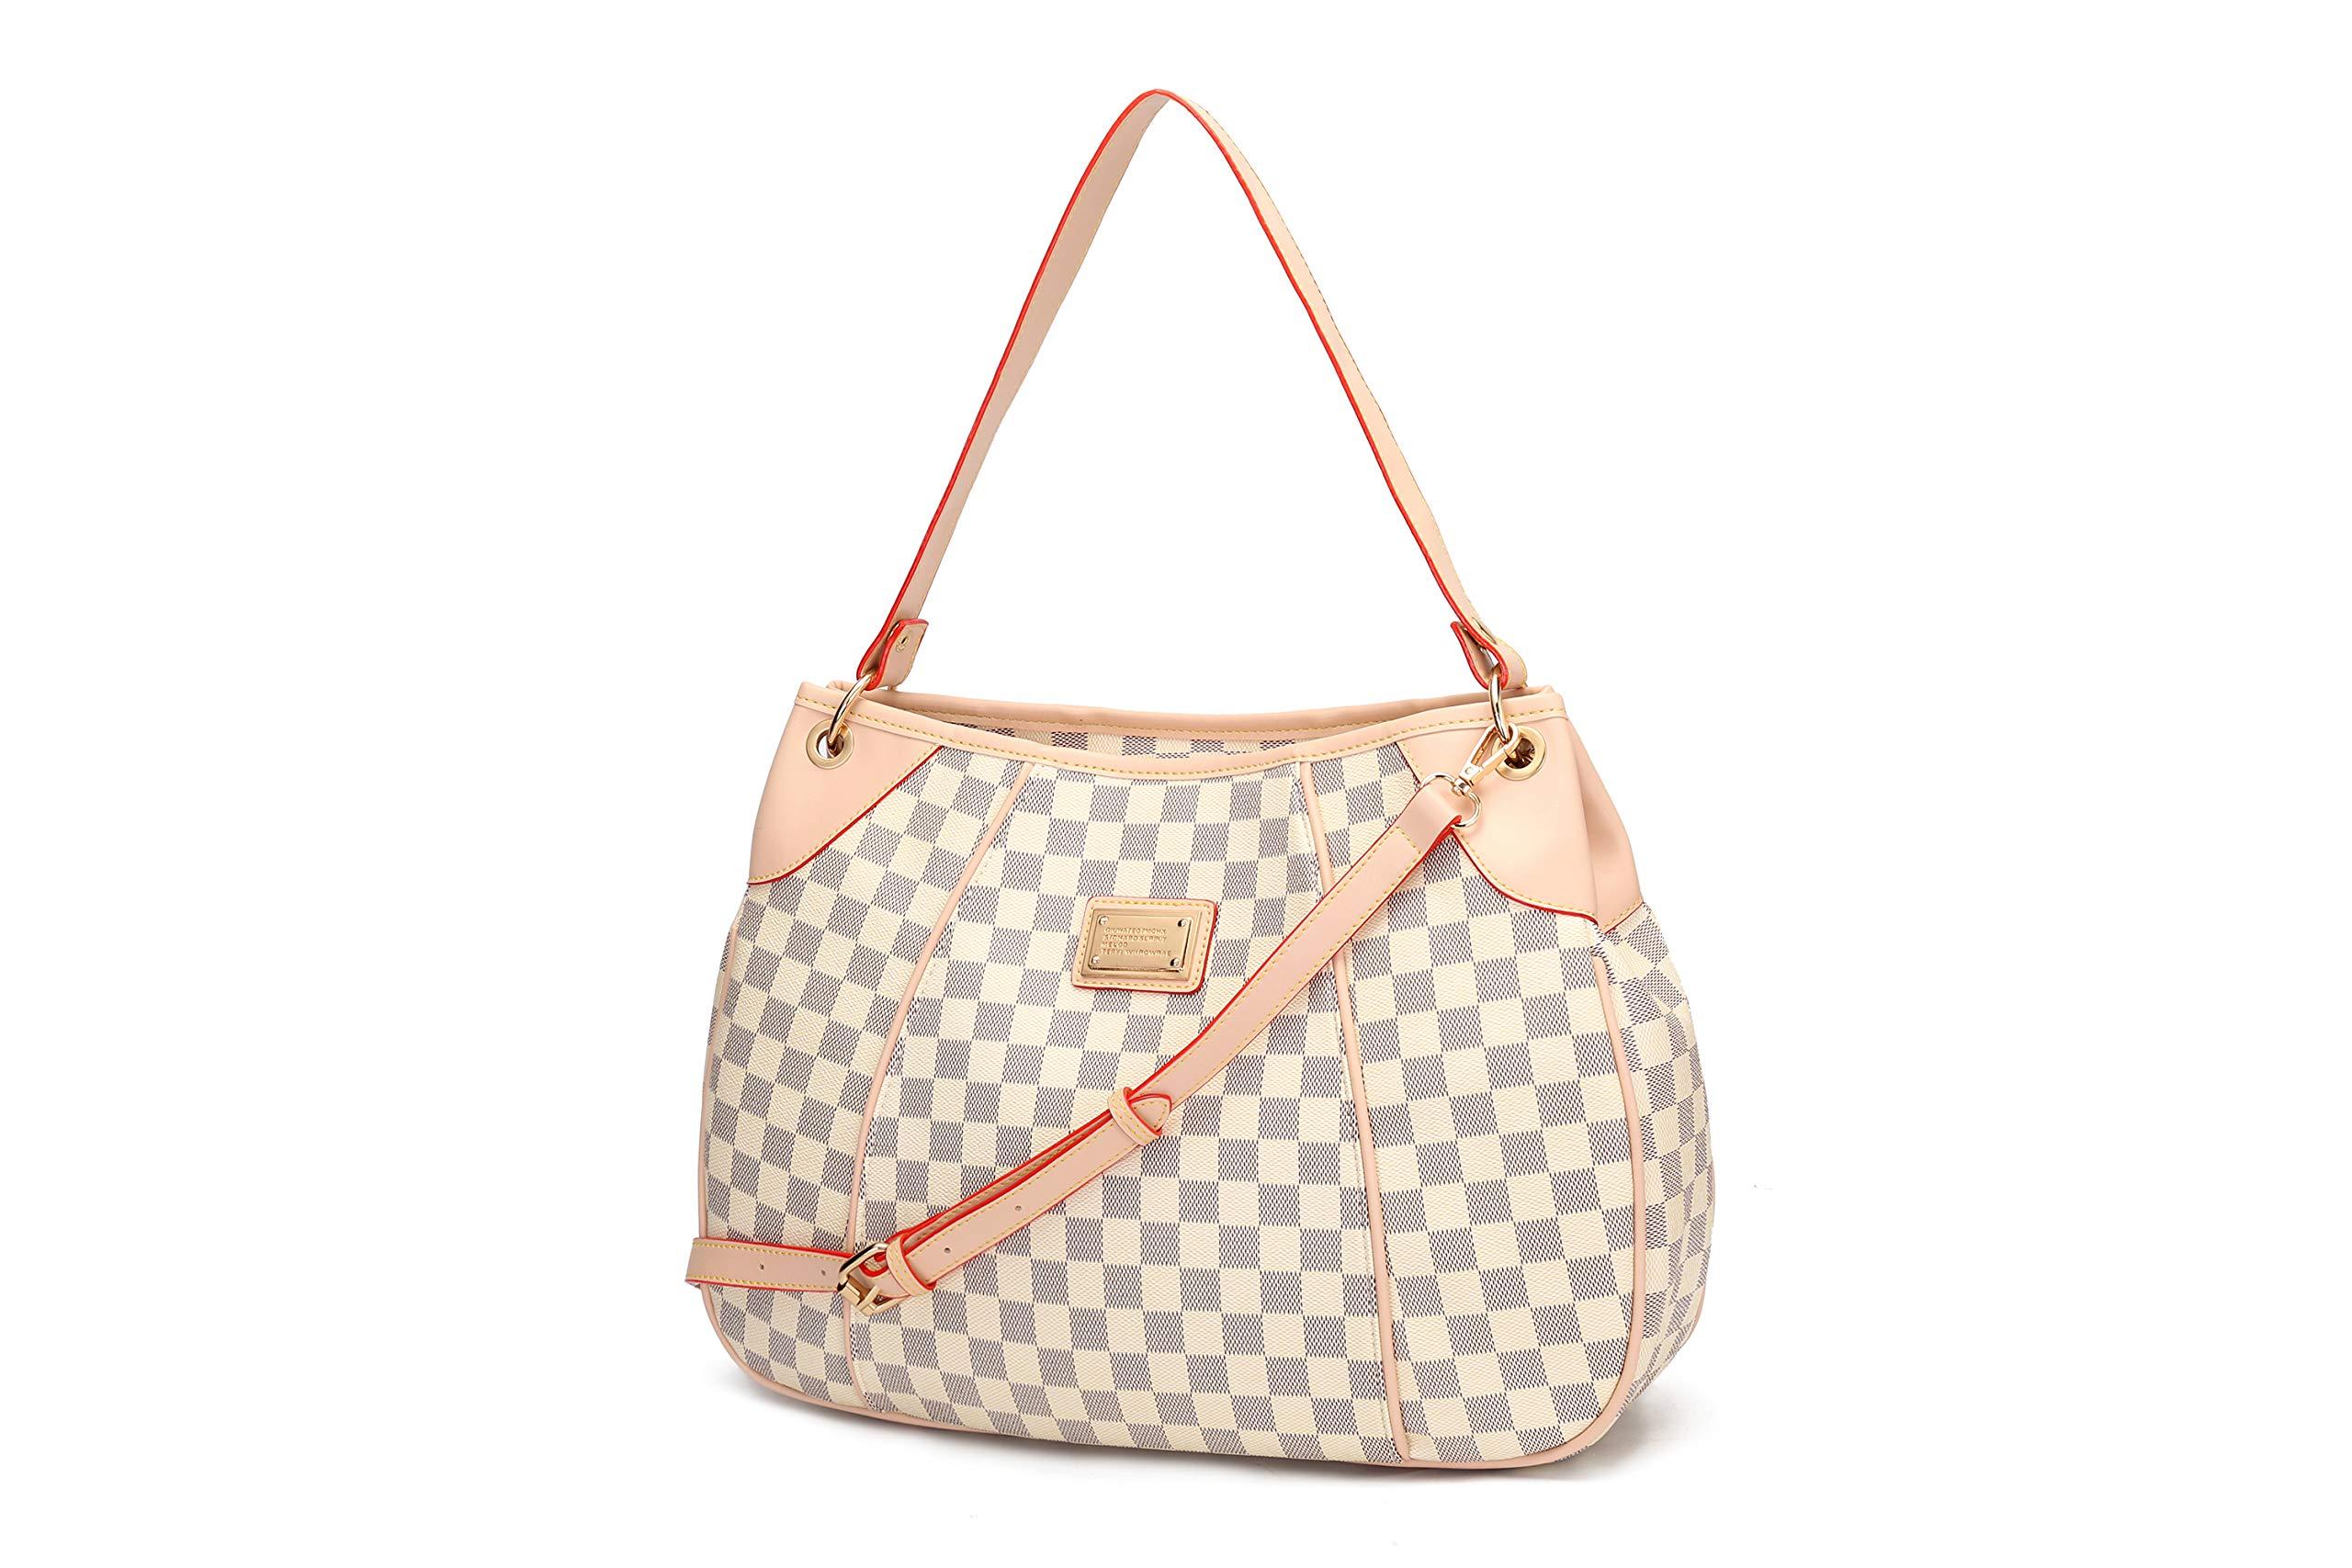 Women Top Handle Satchel Handbags Shoulder Bag Tote Purse Messenger Bags (WH4) by RICHPORTS